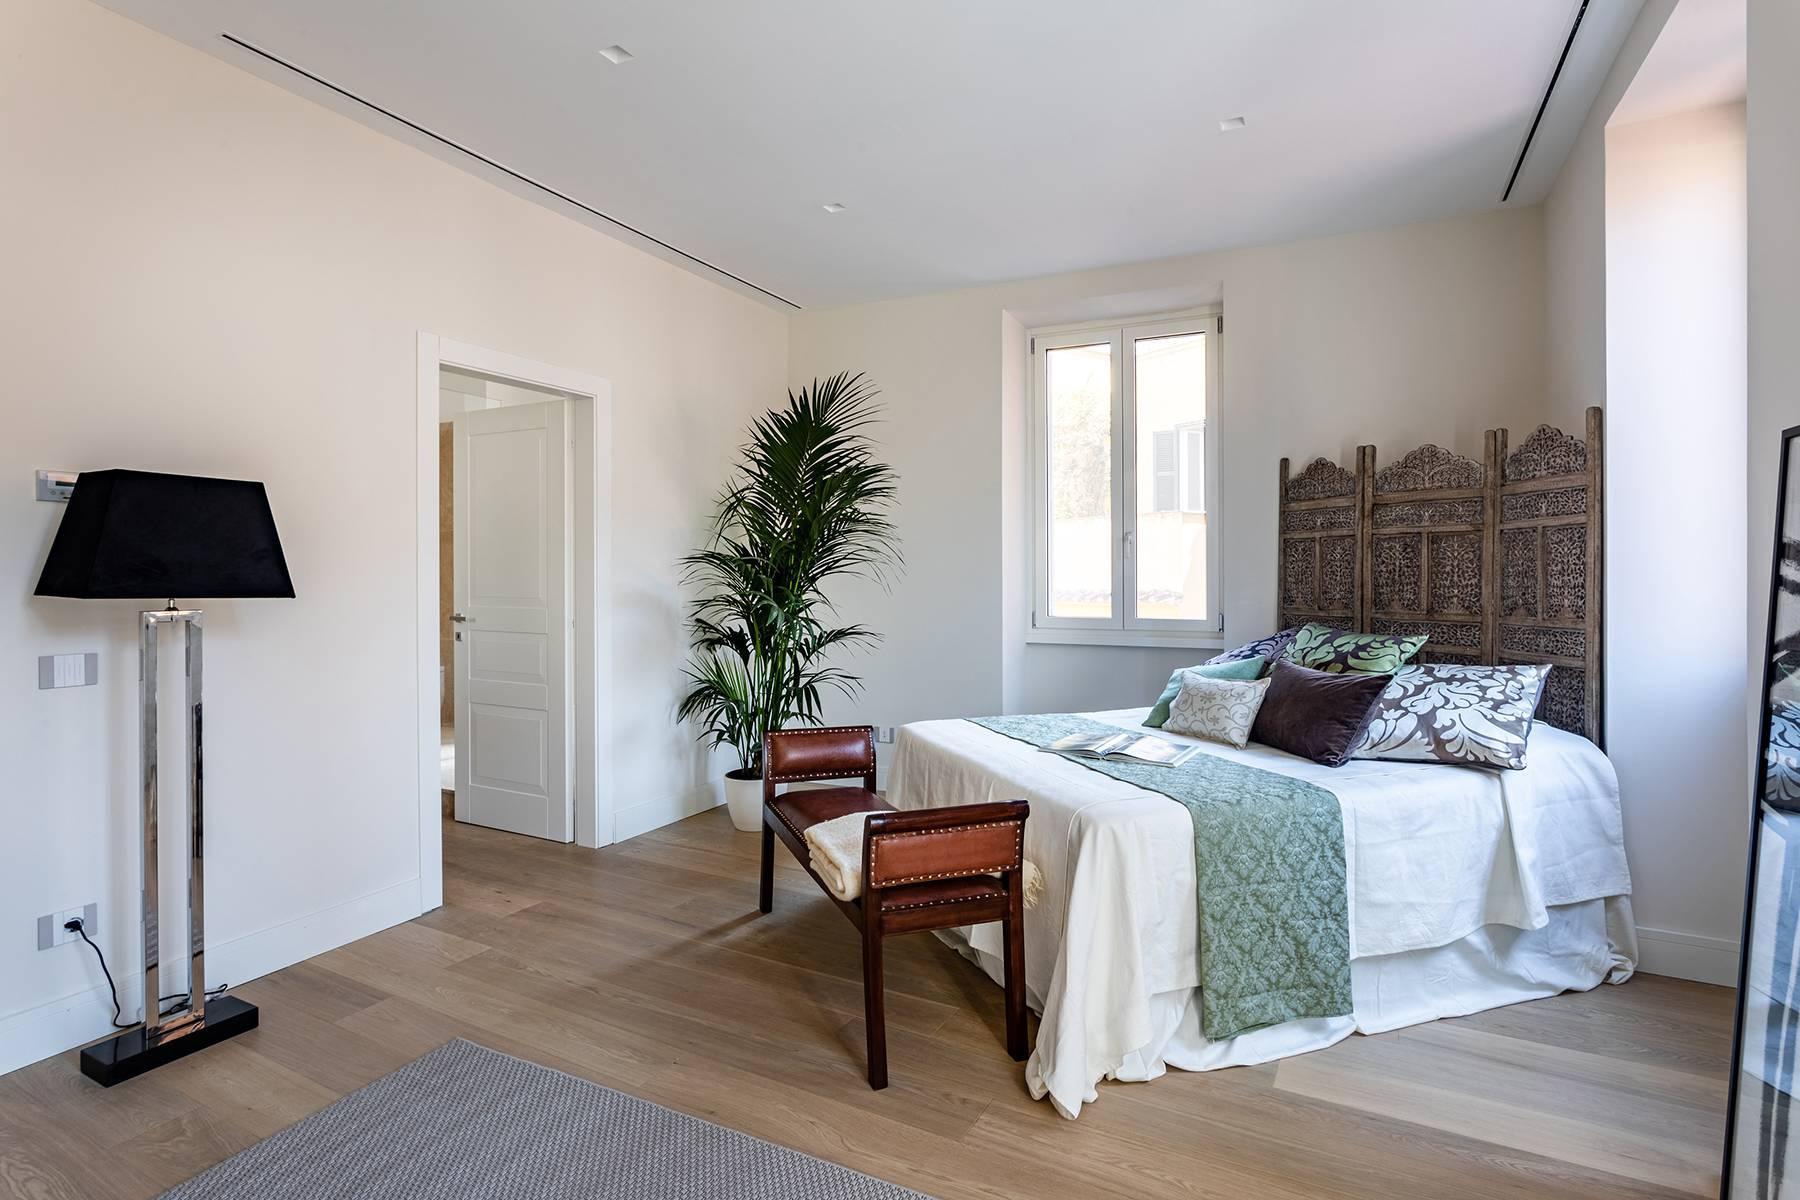 Spanish Steps luxury turnkey apartment - 11